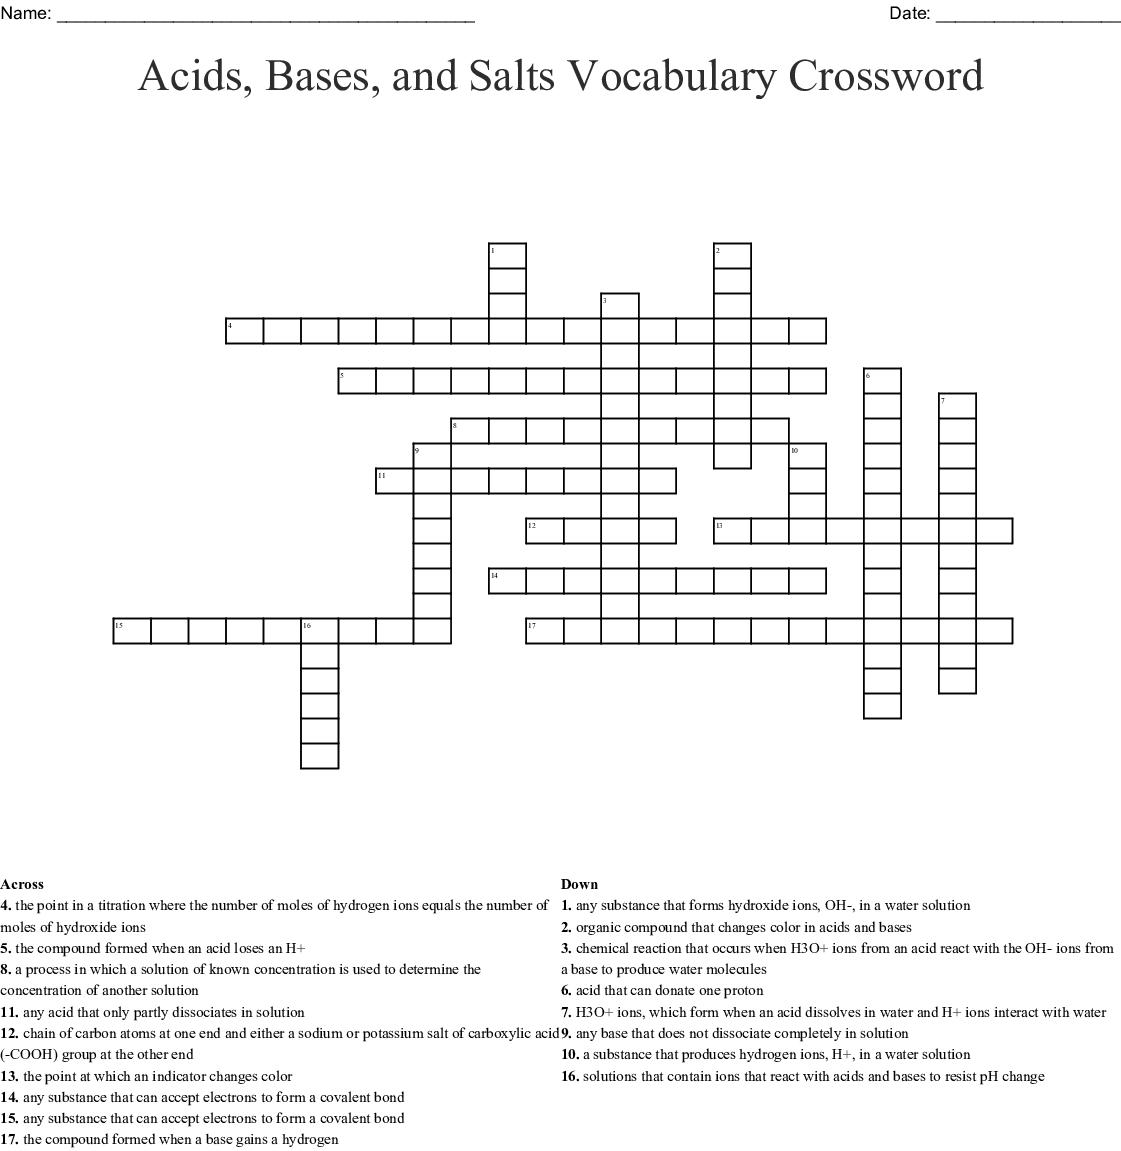 Acids, Bases, and Salts Vocabulary Crossword - WordMint